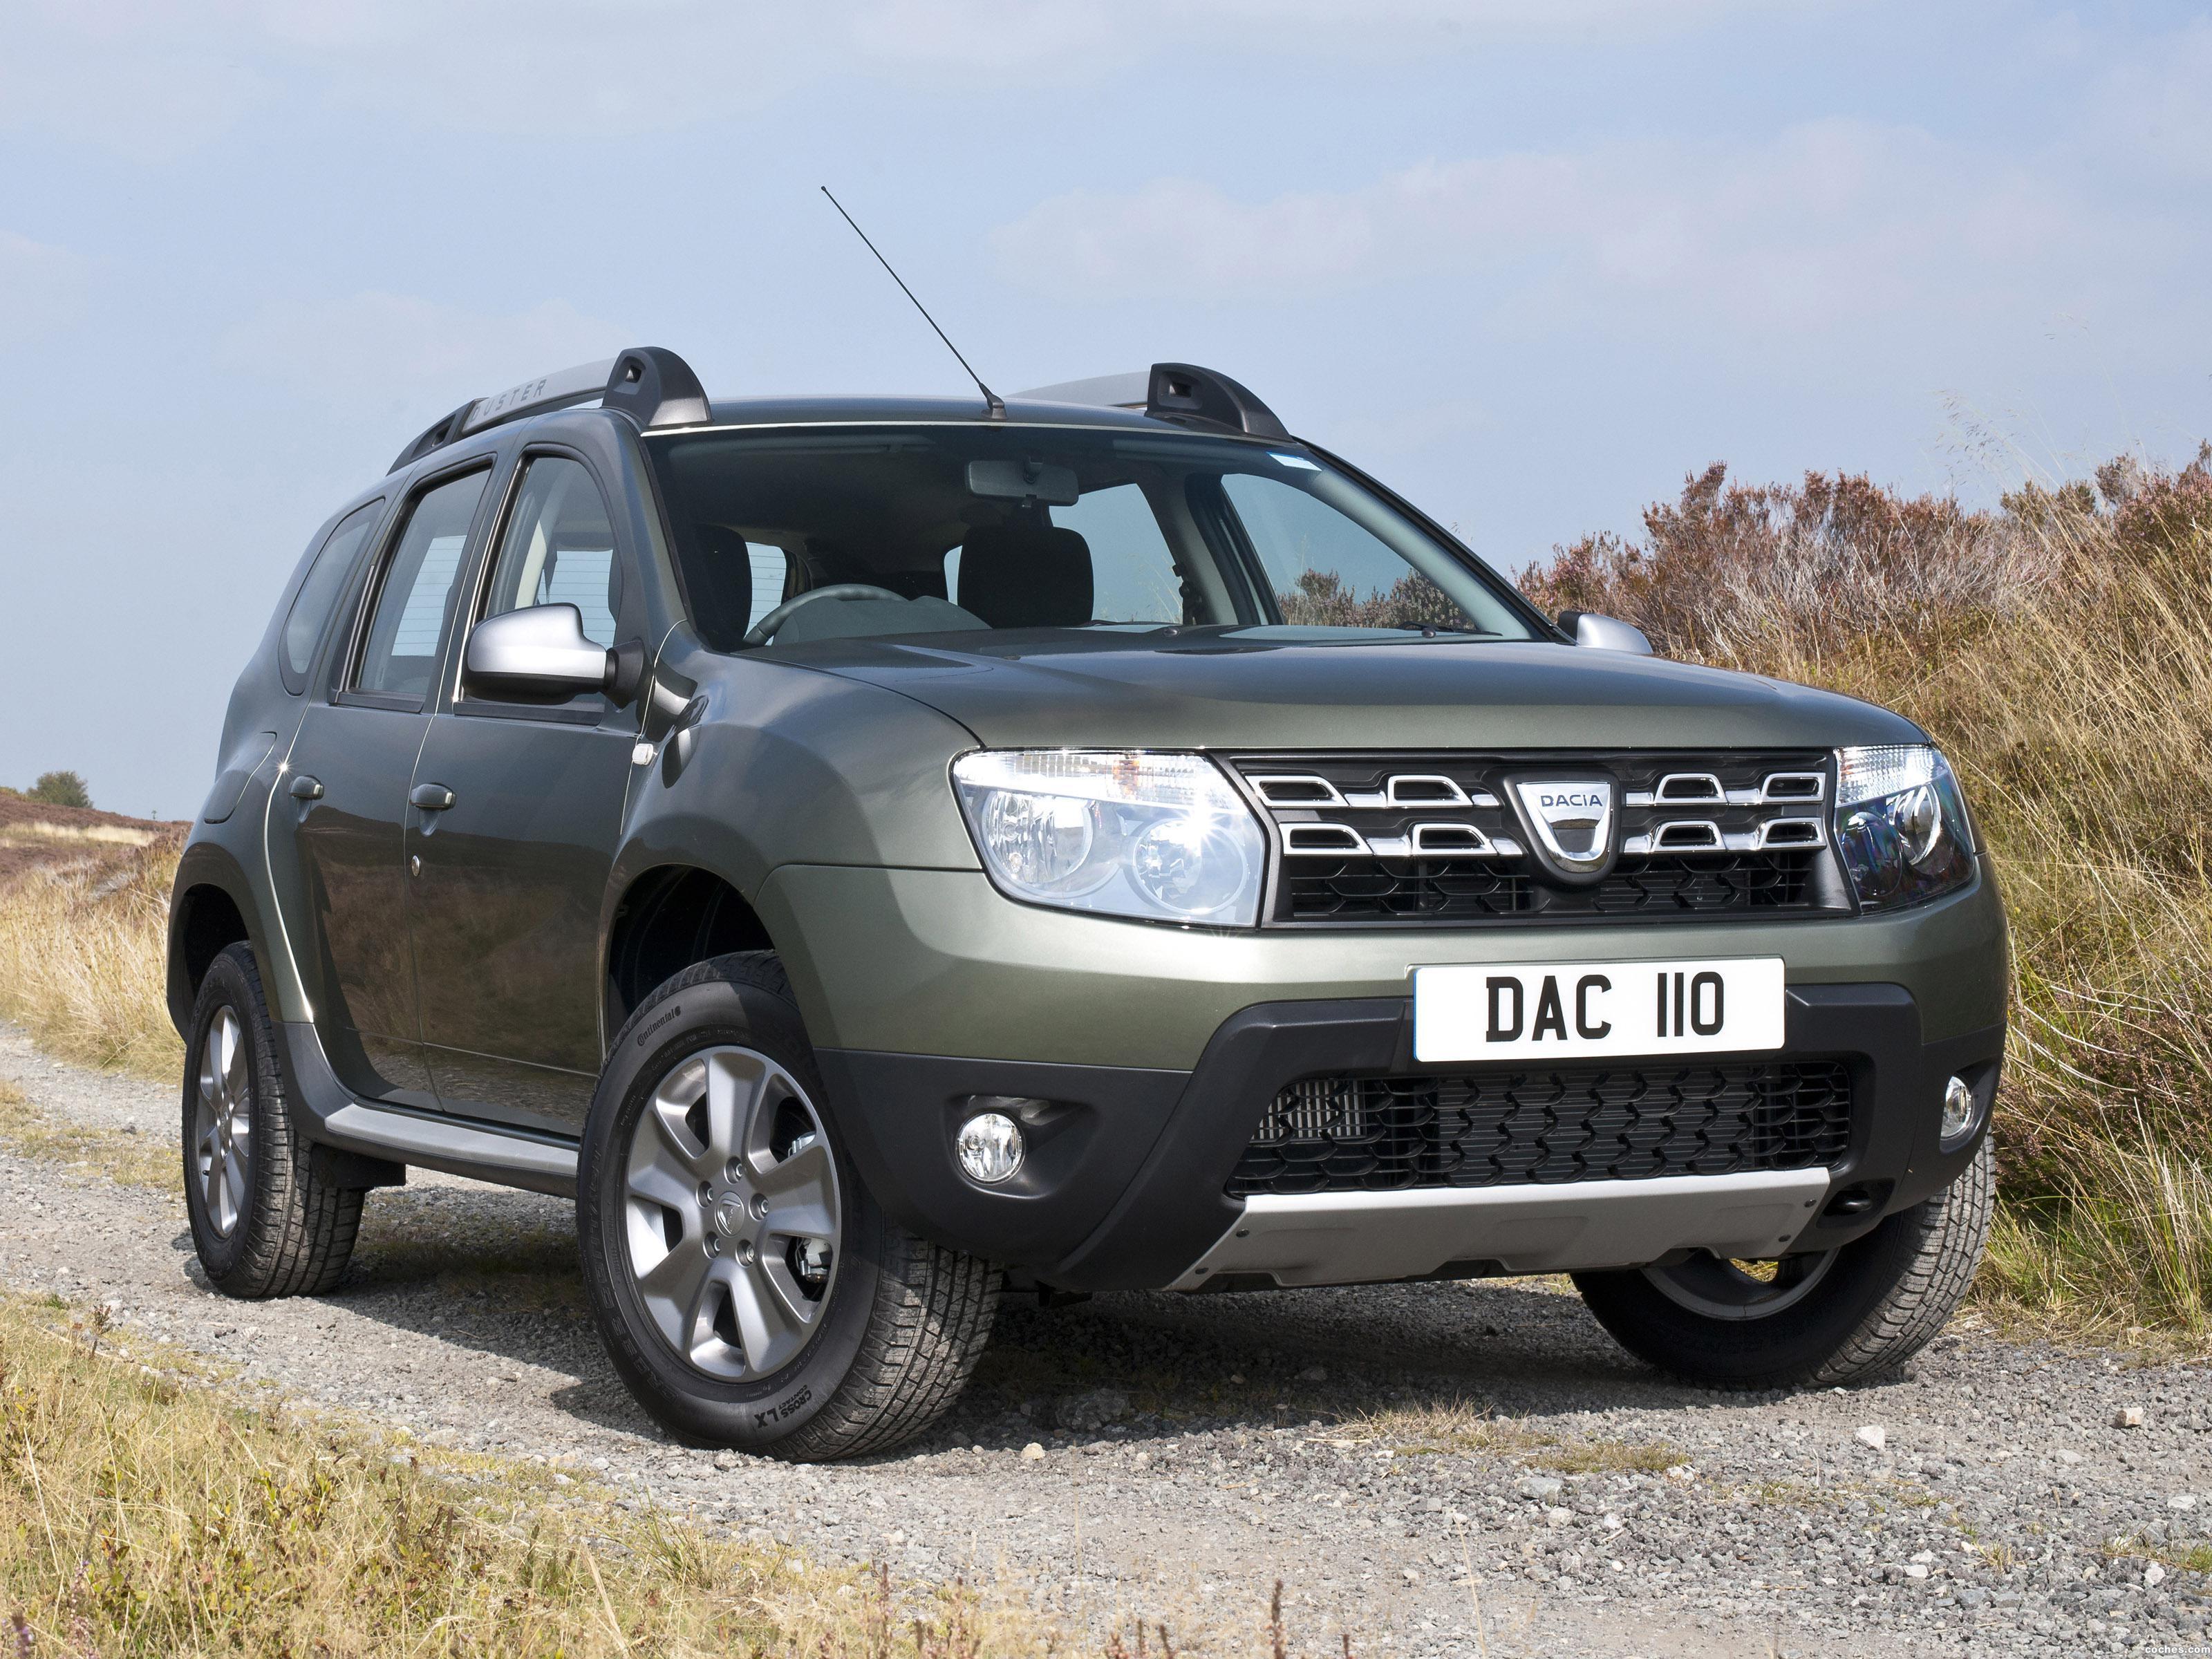 Fotos de dacia duster uk 2014 for Dacia duster interni 2014